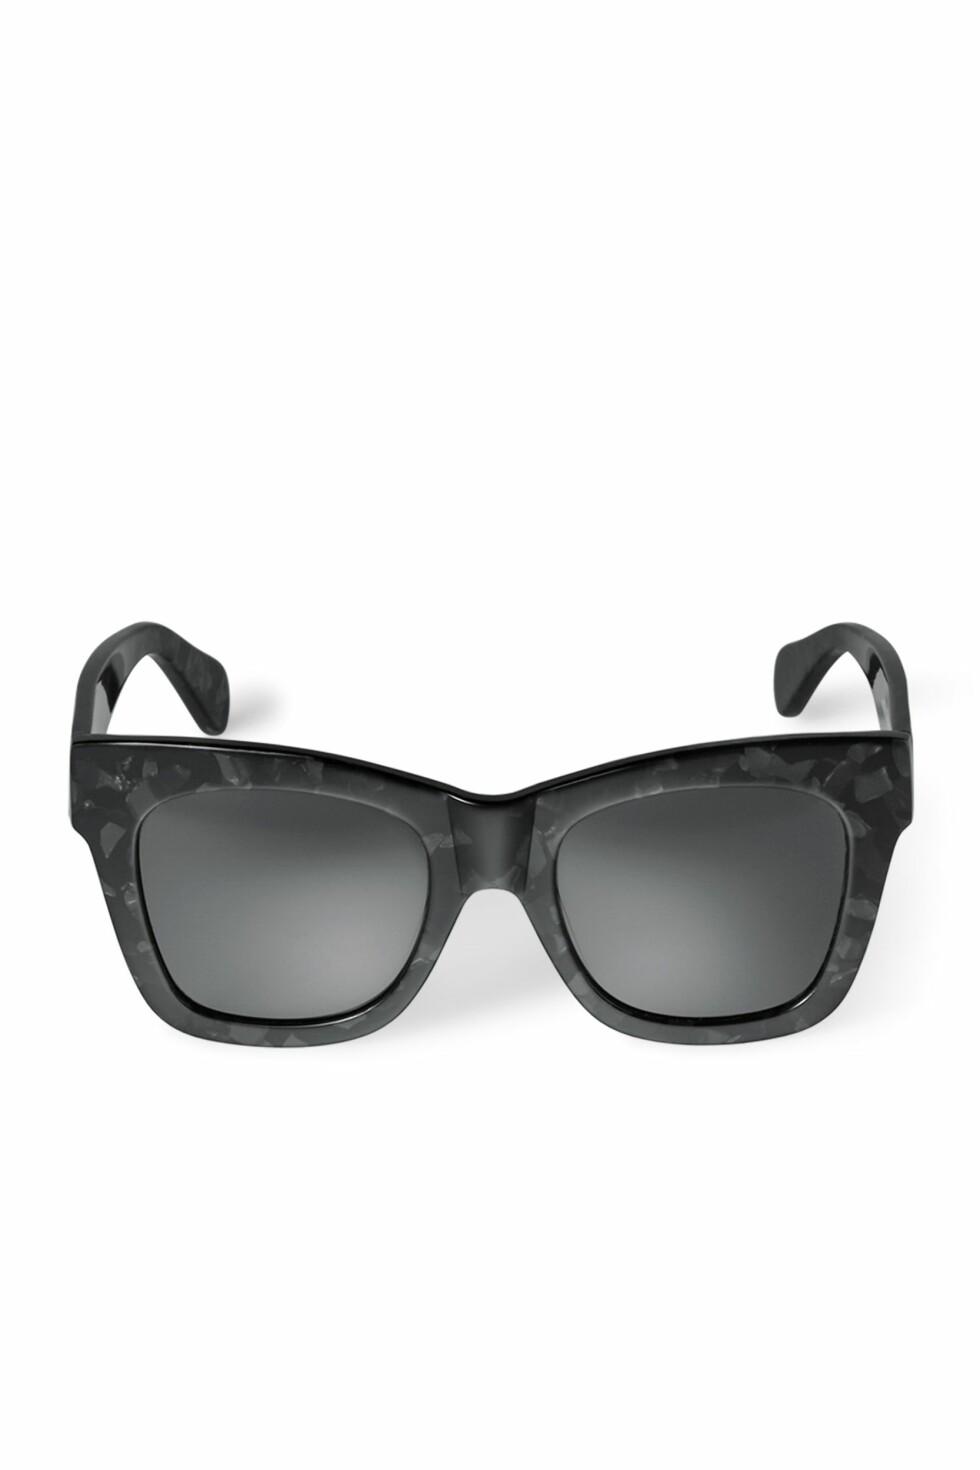 Solbriller fra Weekday   kr 350   http://shop.weekday.com/se/Womens_shop/Accessories/Sunglasses/Voyage_Acetate_Sunglasses/5131397-11115618.1#c-49929